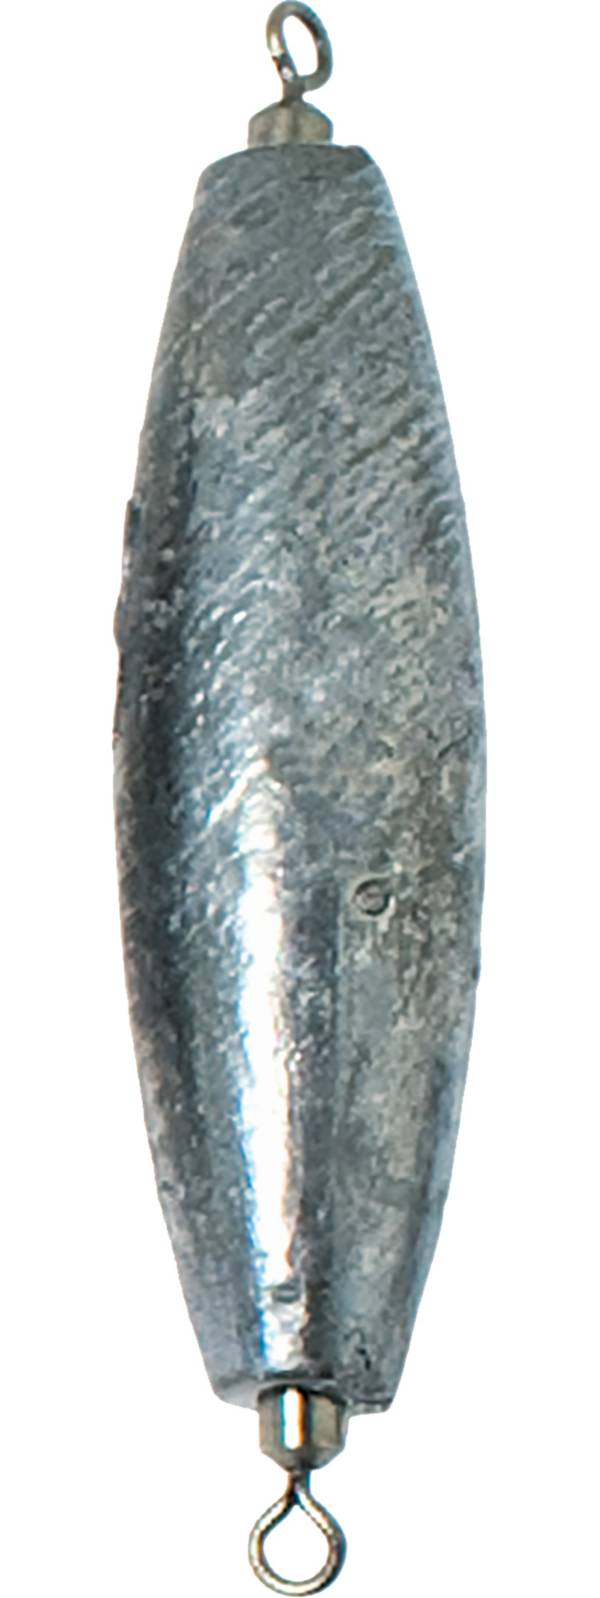 Eagle Claw Swiveling Trolling Sinker product image